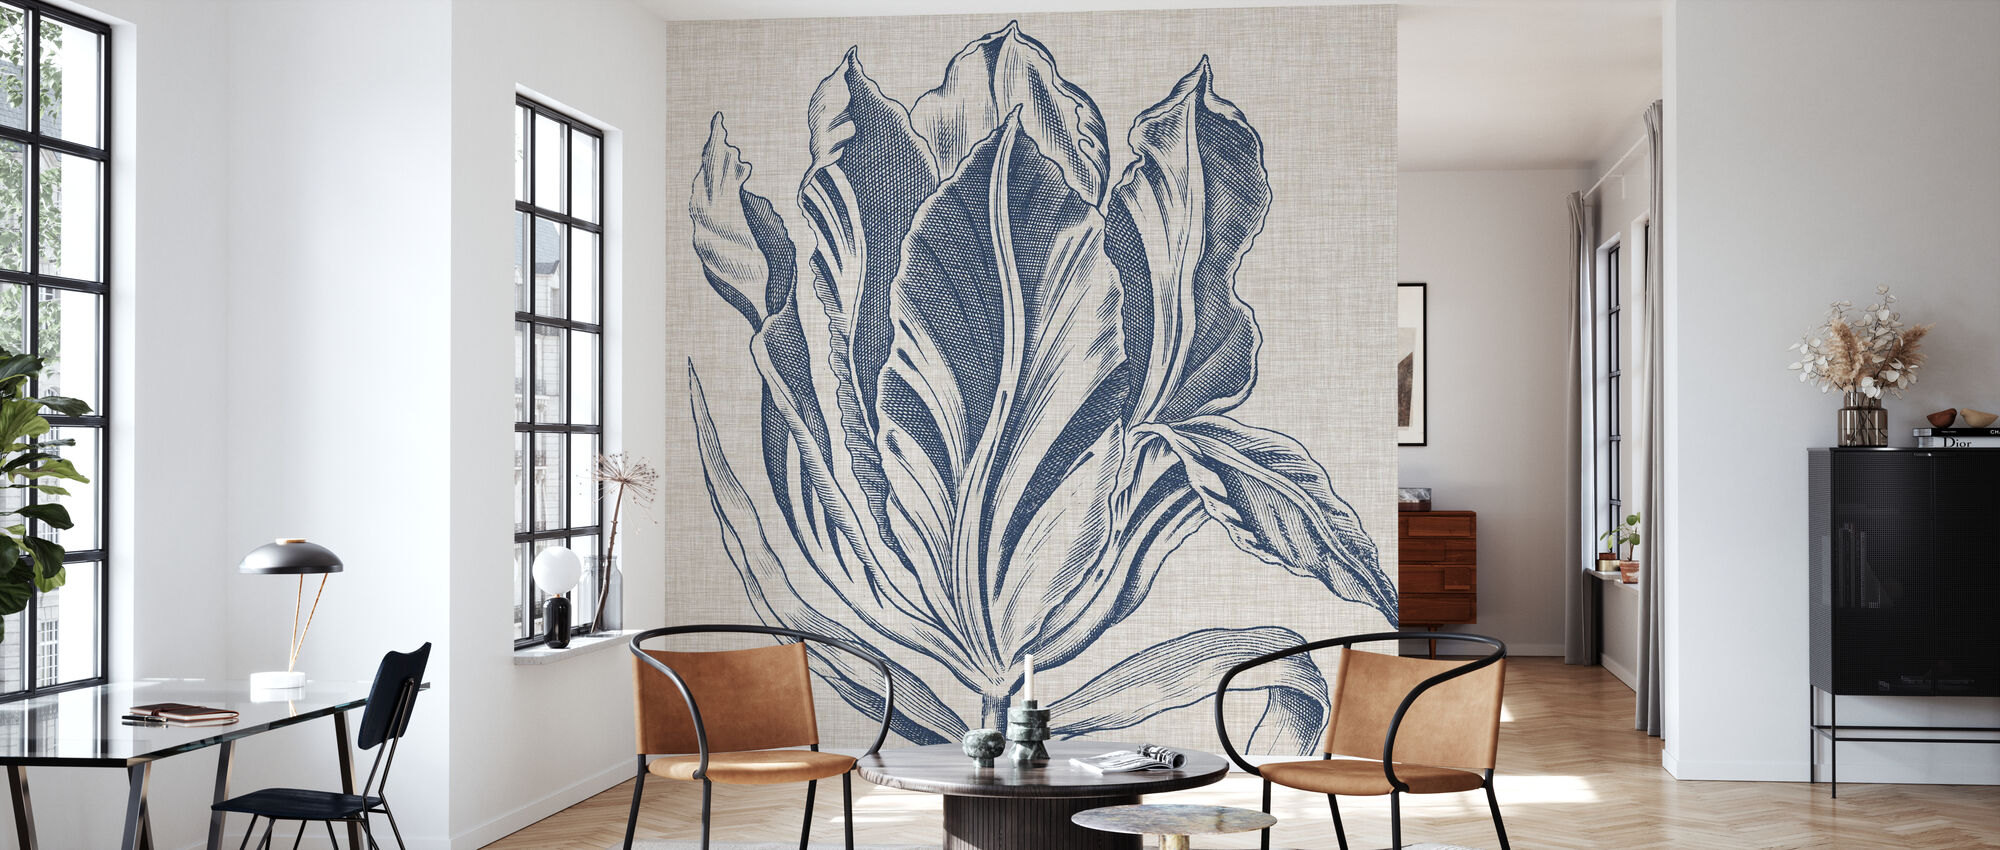 Indigo Floral on Linen - Wallpaper - Living Room